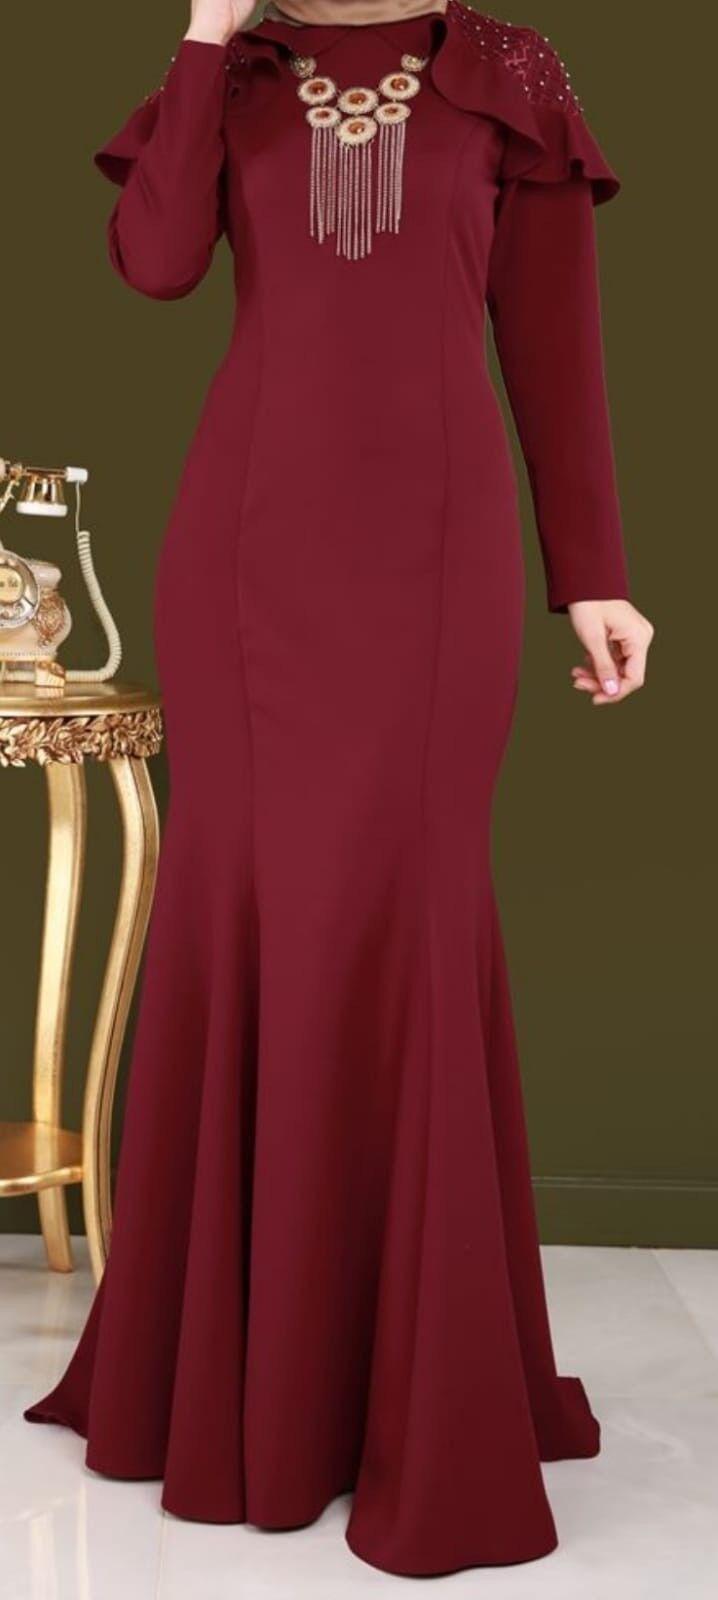 Neu Kleid Rot gr 44 46 Ballkleid Abendkleid Cocktailkleid